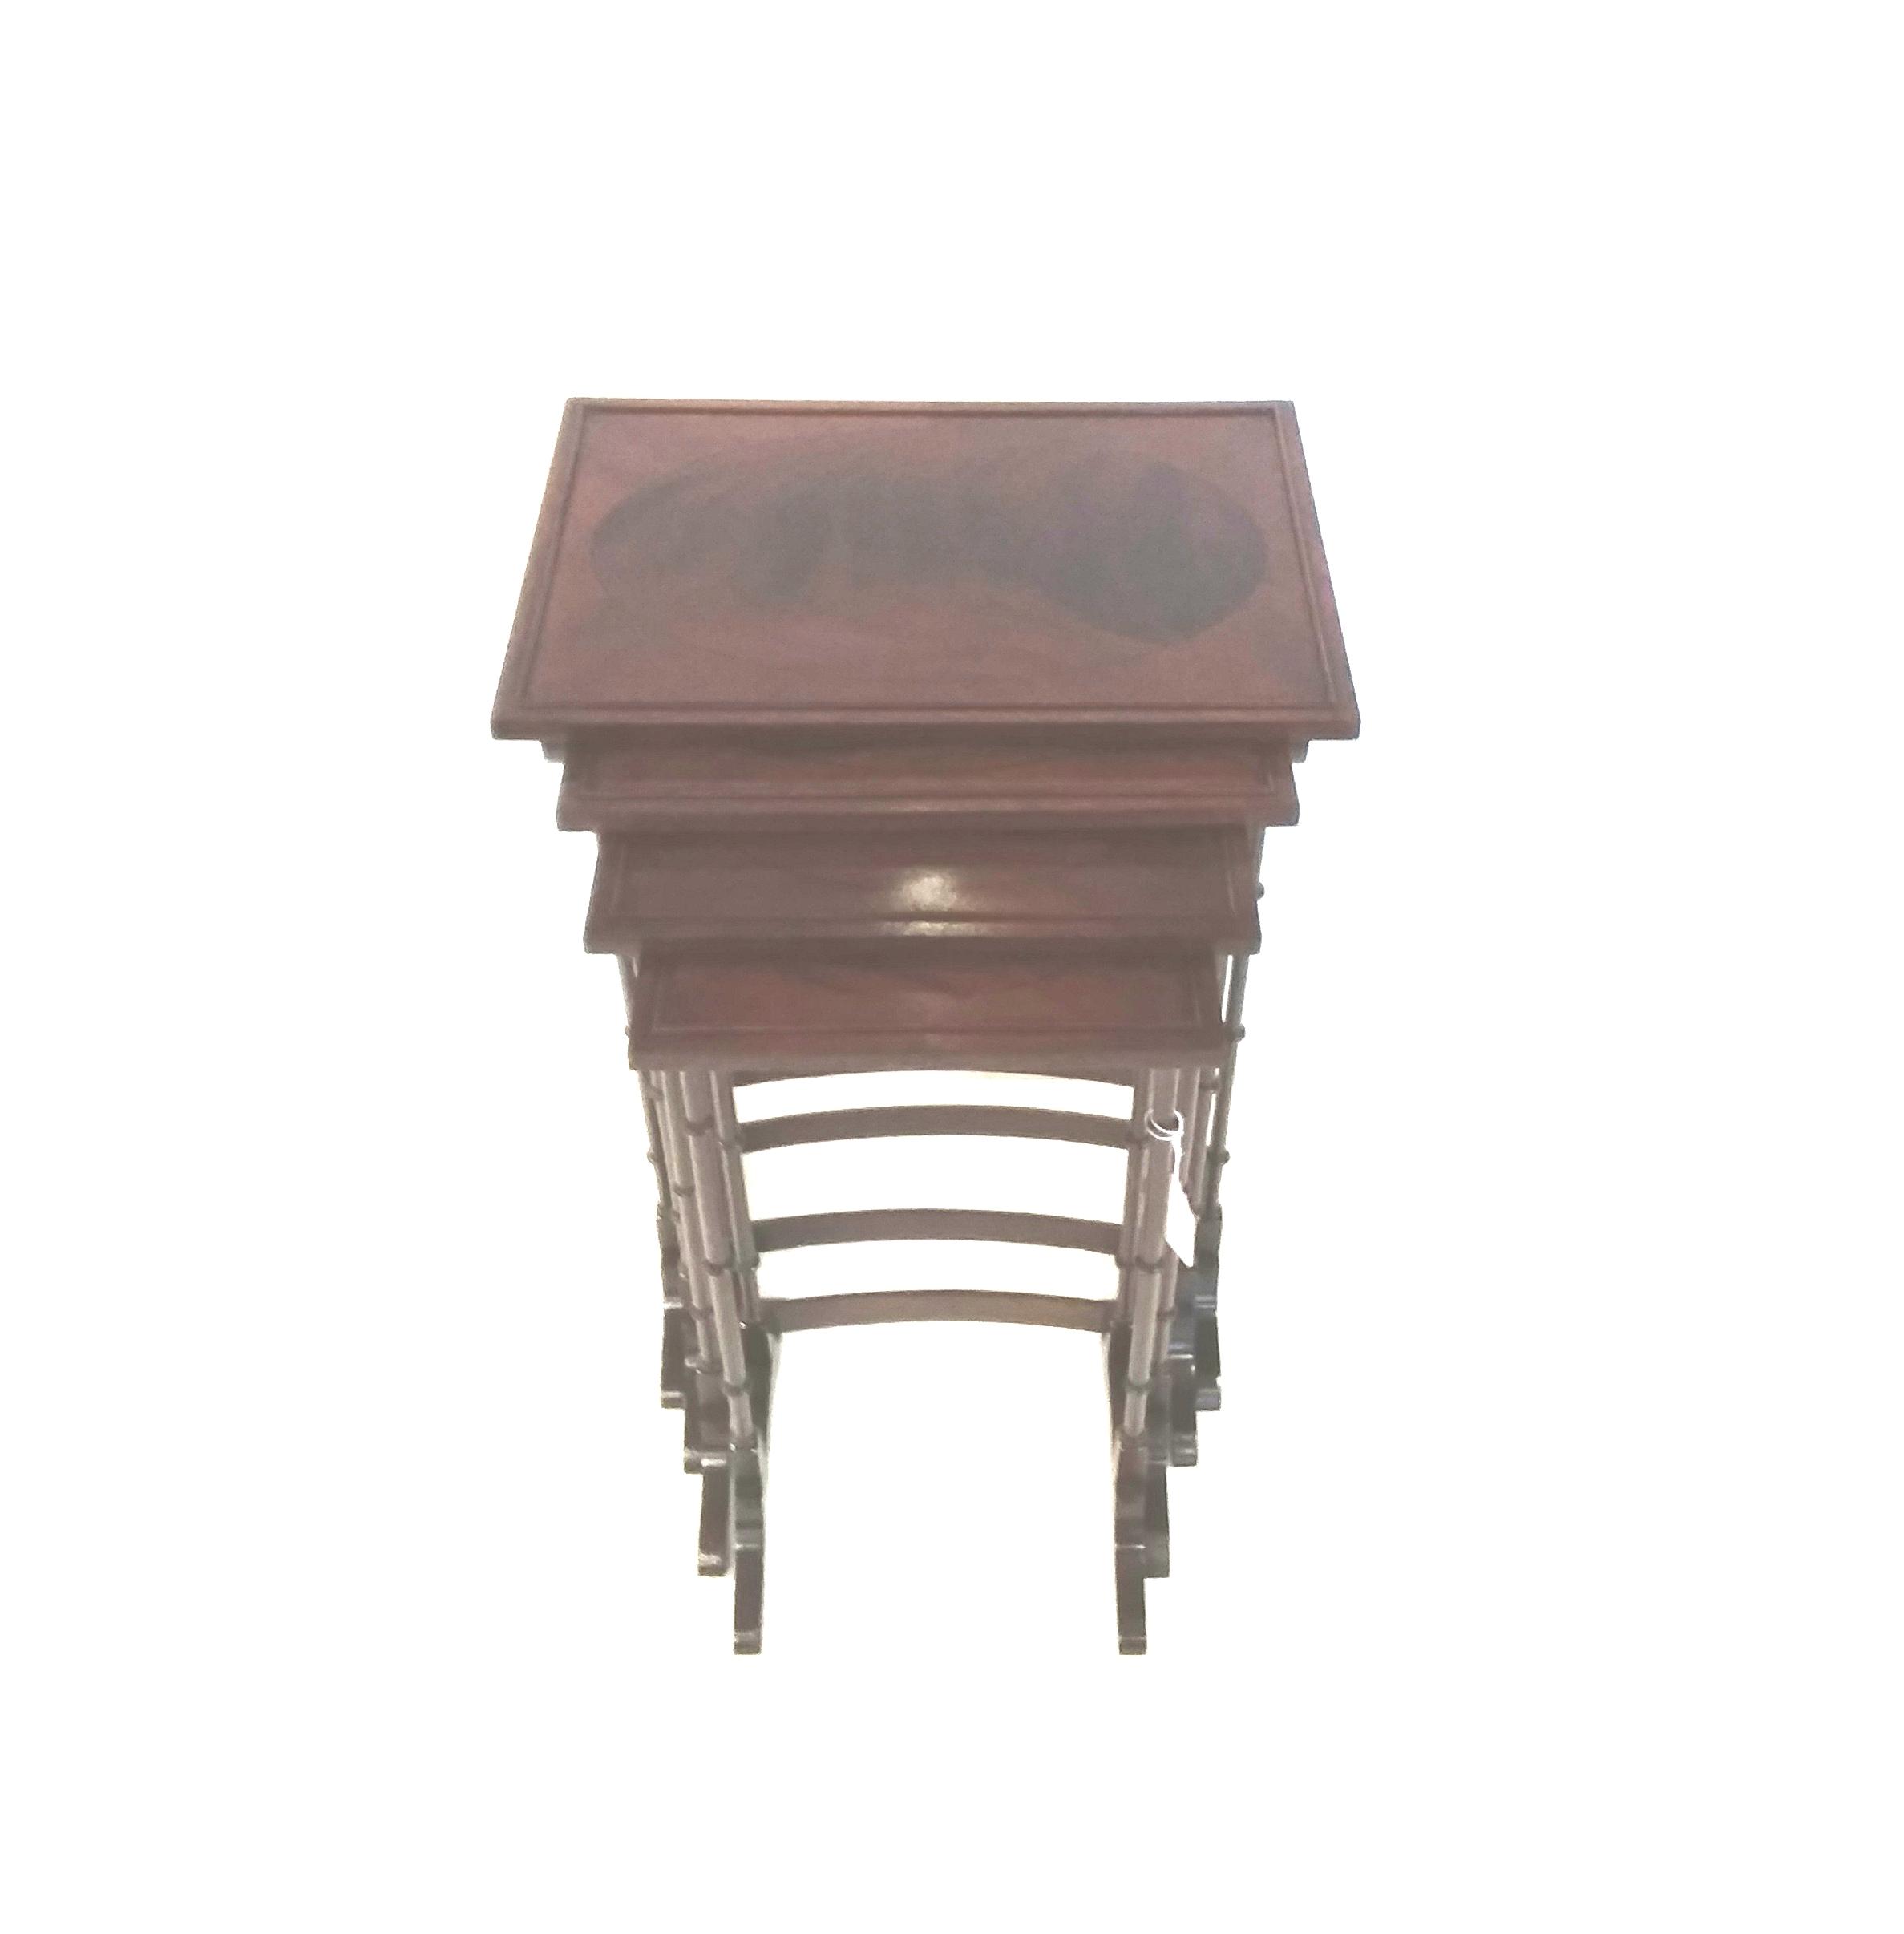 Antique Edwardian Nest of Tables